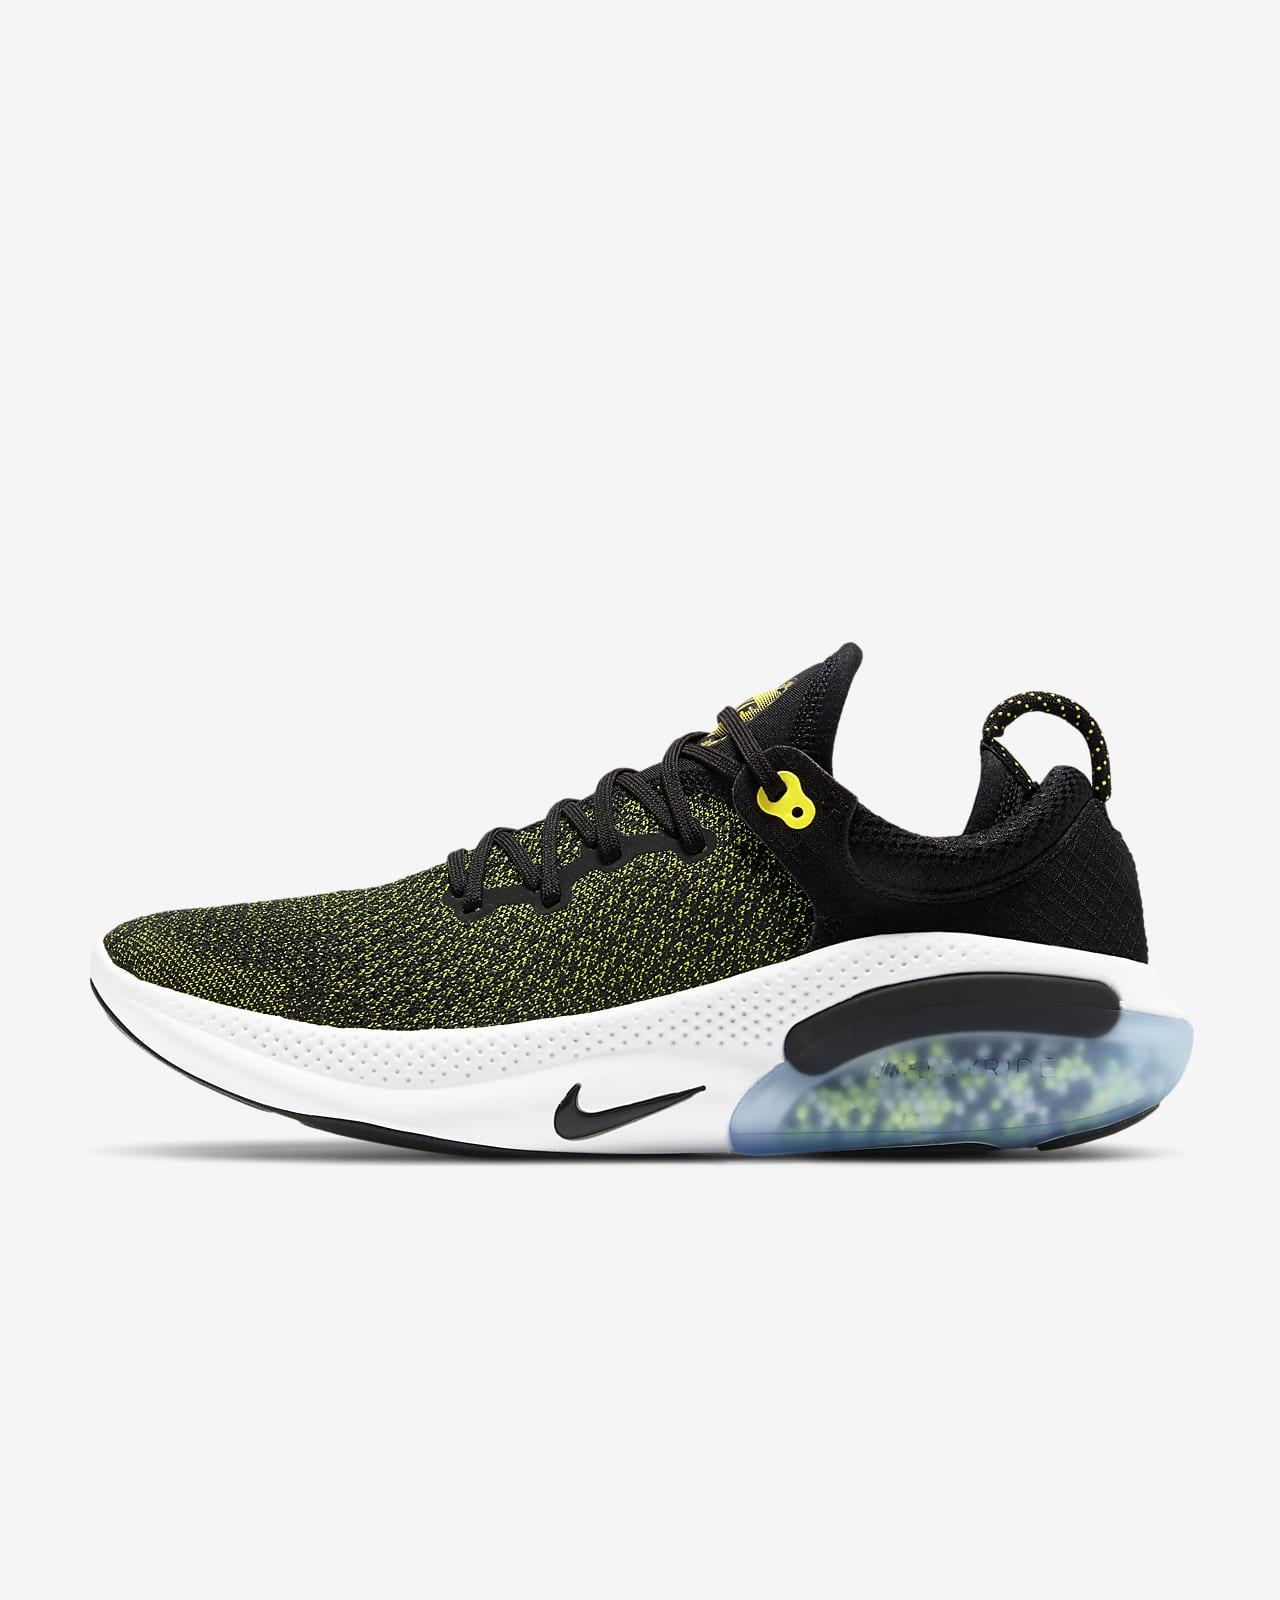 zona marca Mayo  Calzado de running para hombre Nike Joyride Run Flyknit. Nike MX